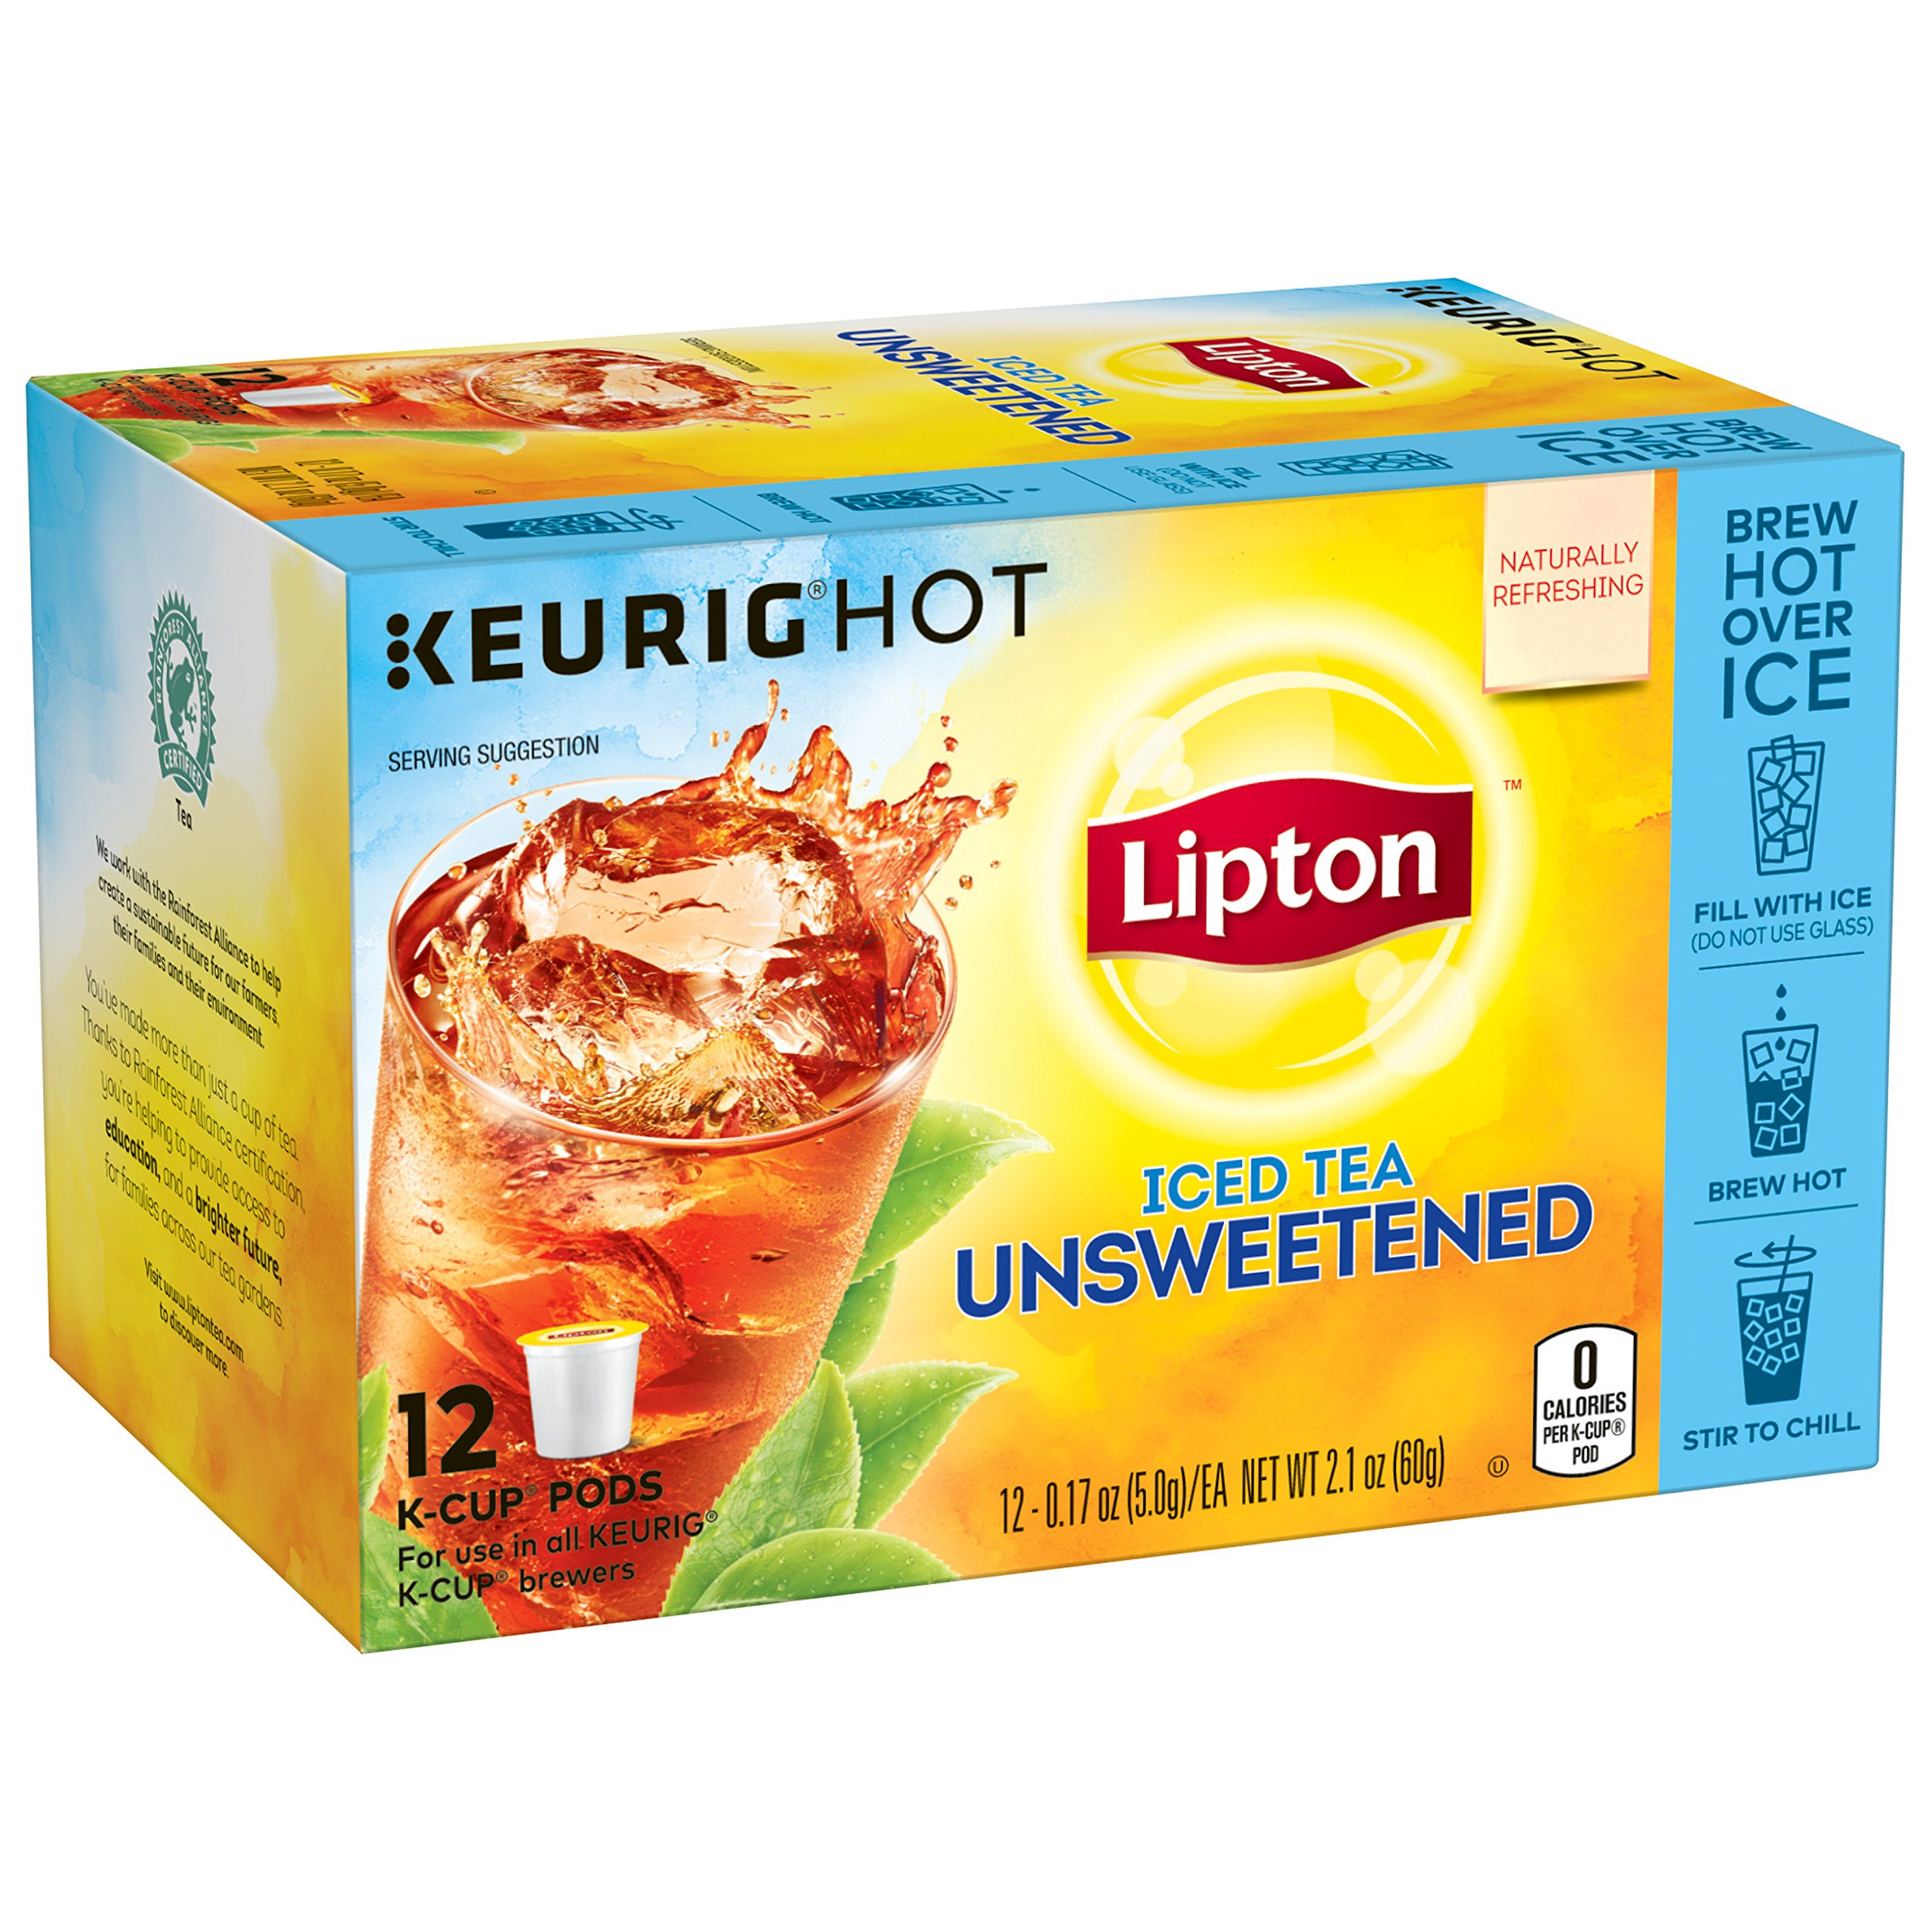 Lipton Iced Tea K-Cups, Iced Tea Unsweetened 12 ct